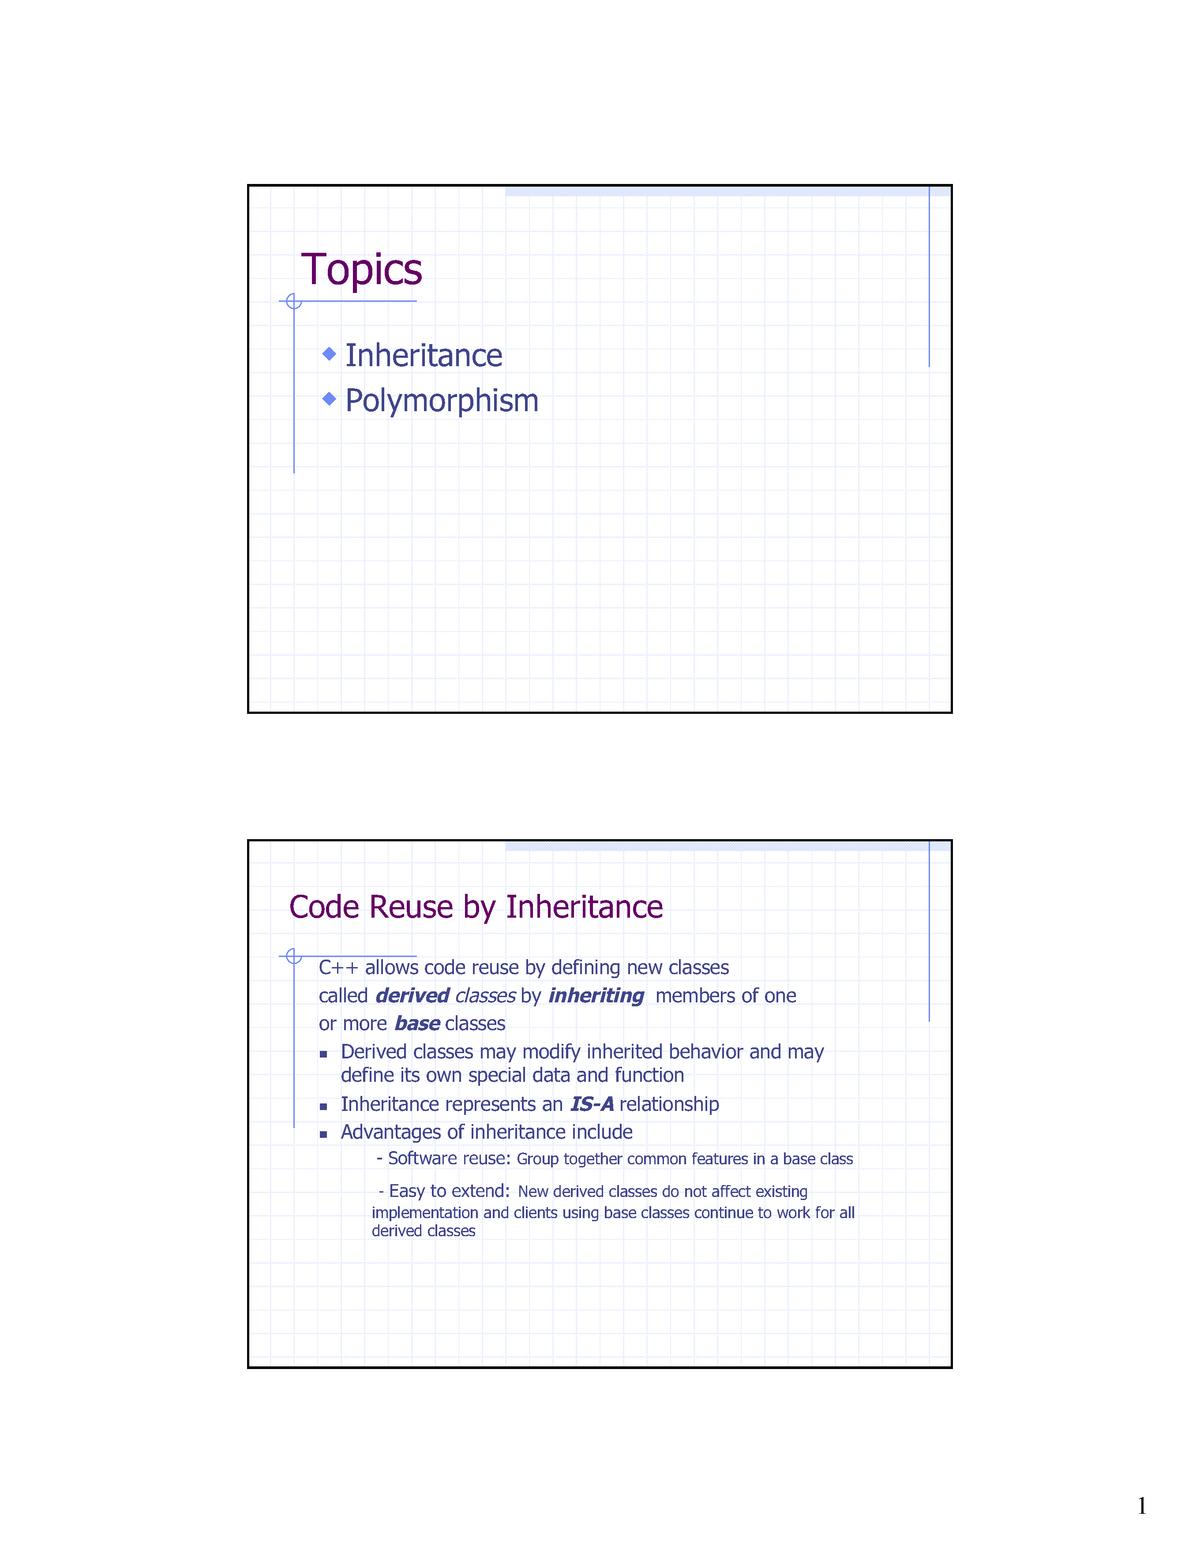 Lecture Notes 9 - Inheritance - Computer Science 2620 - StuDocu